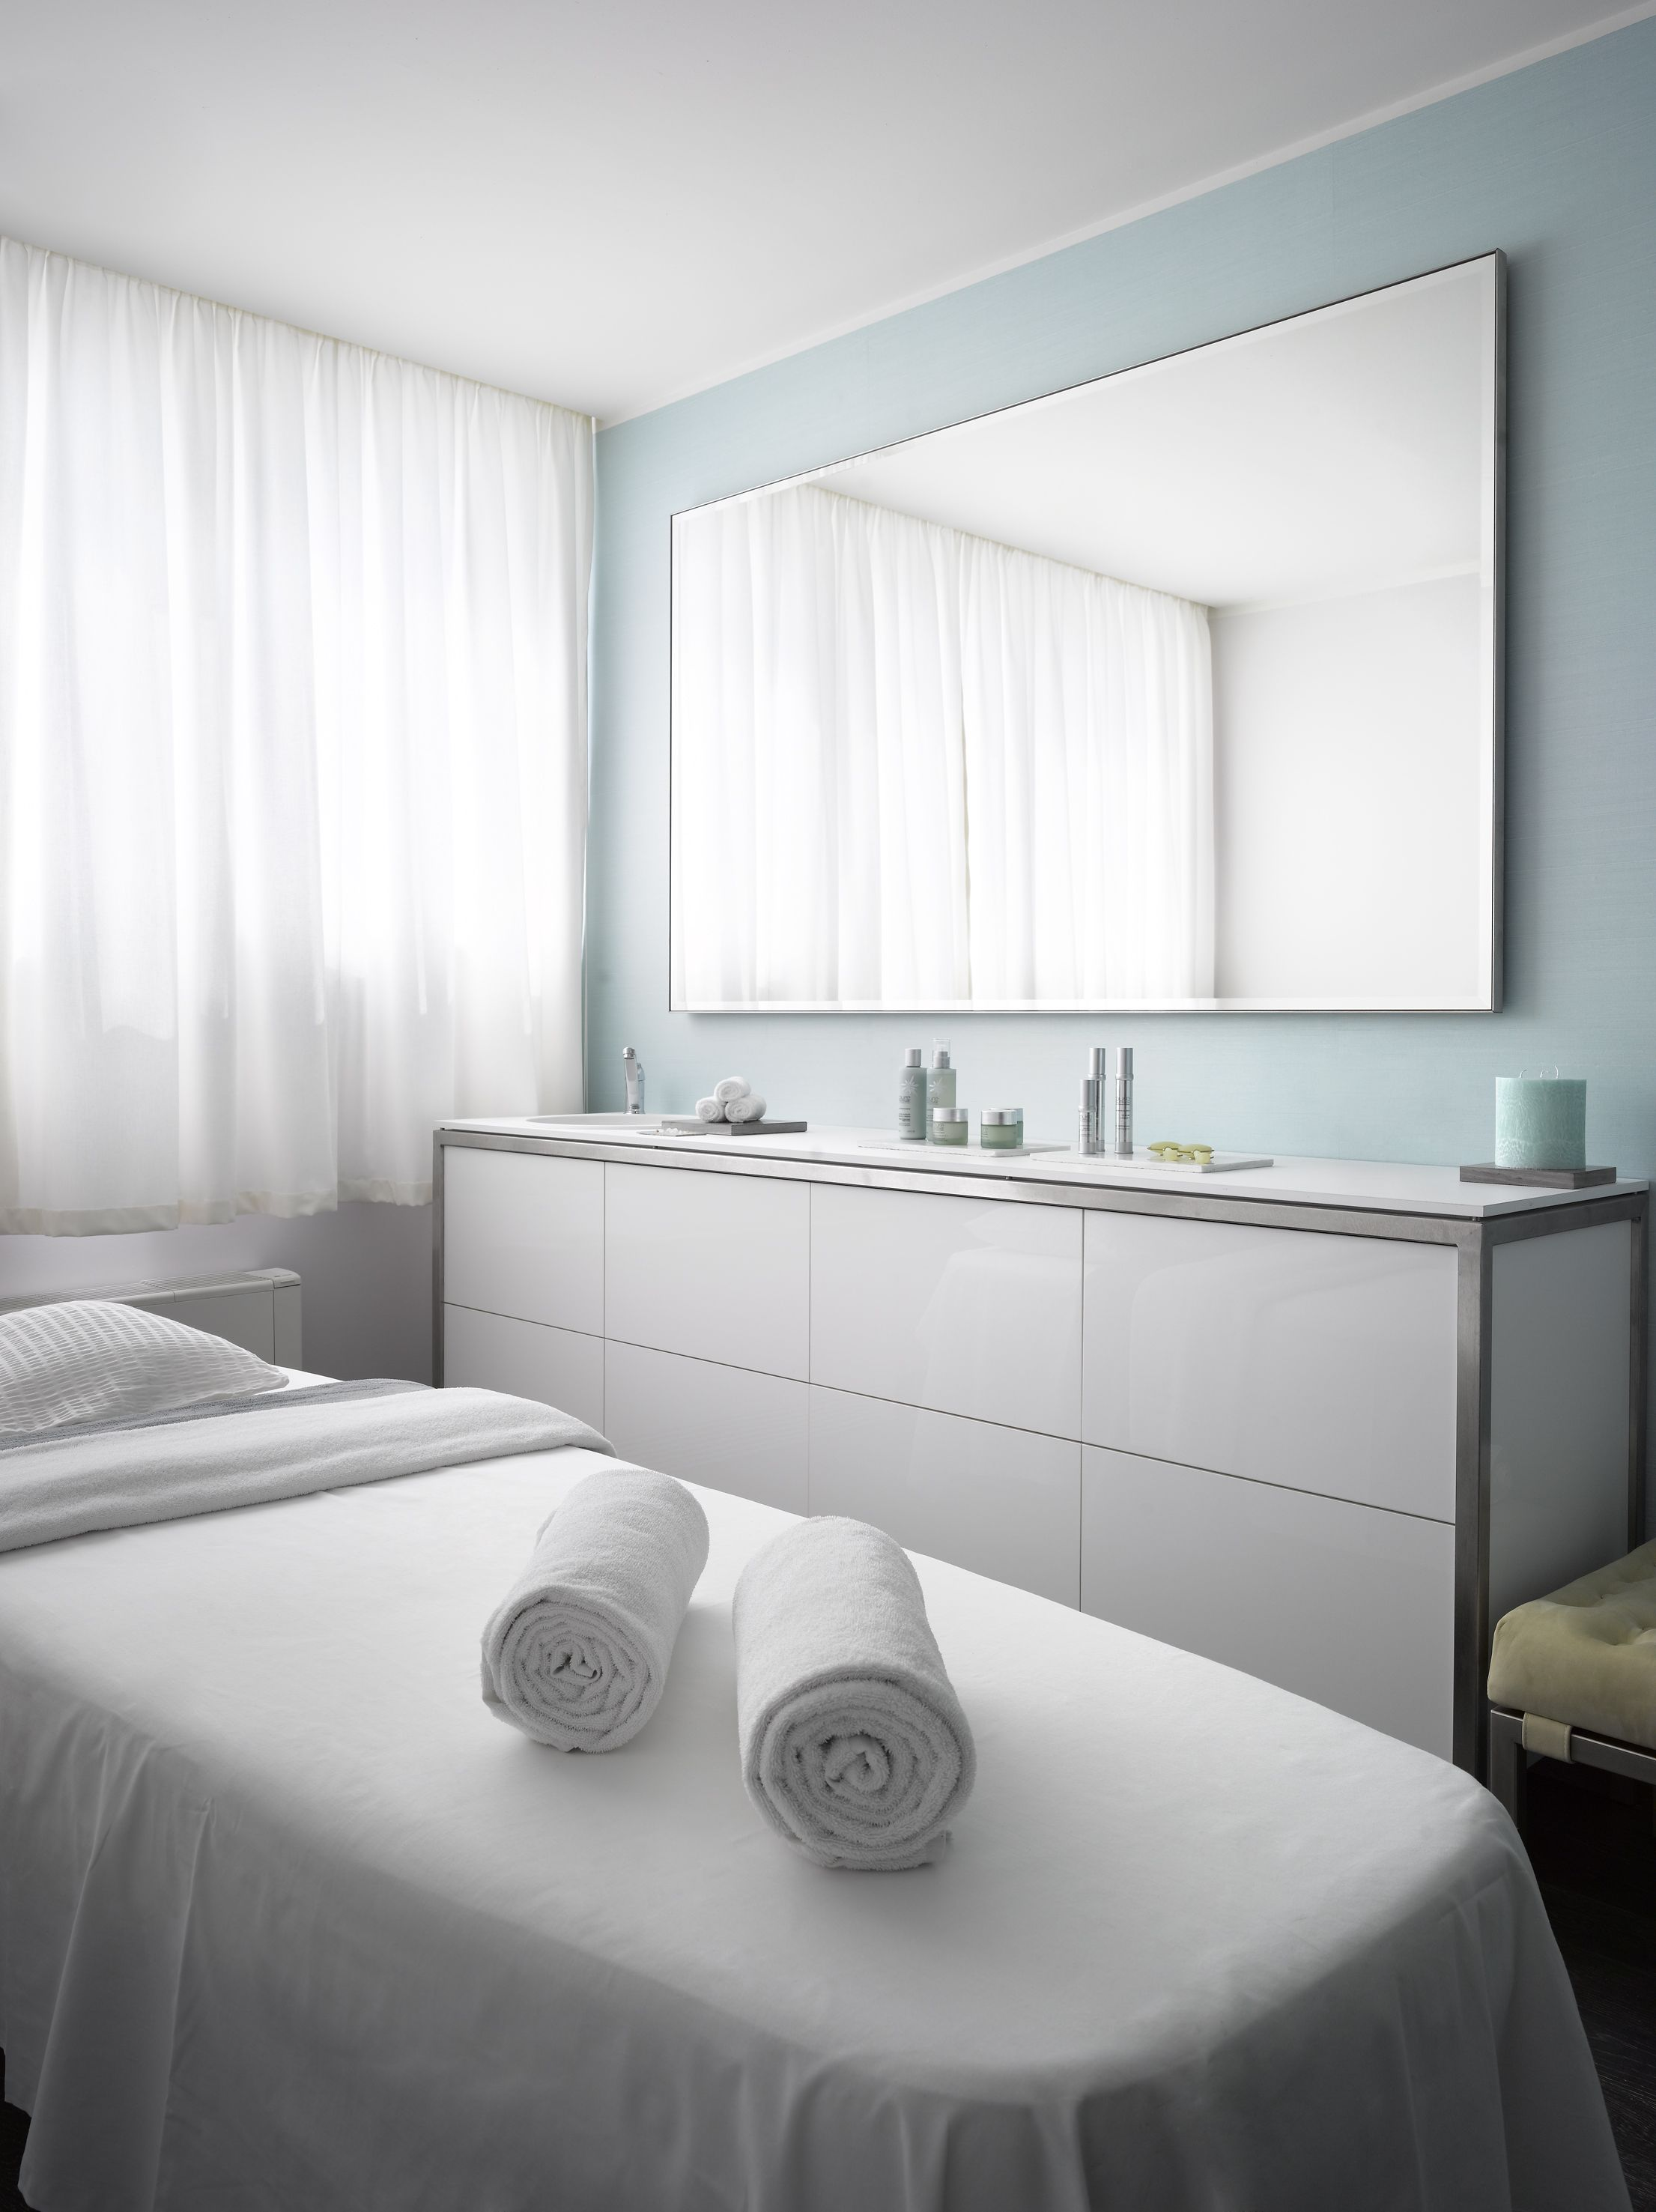 The M Spa Treatment Room wwwm spa praguecom Massage Room